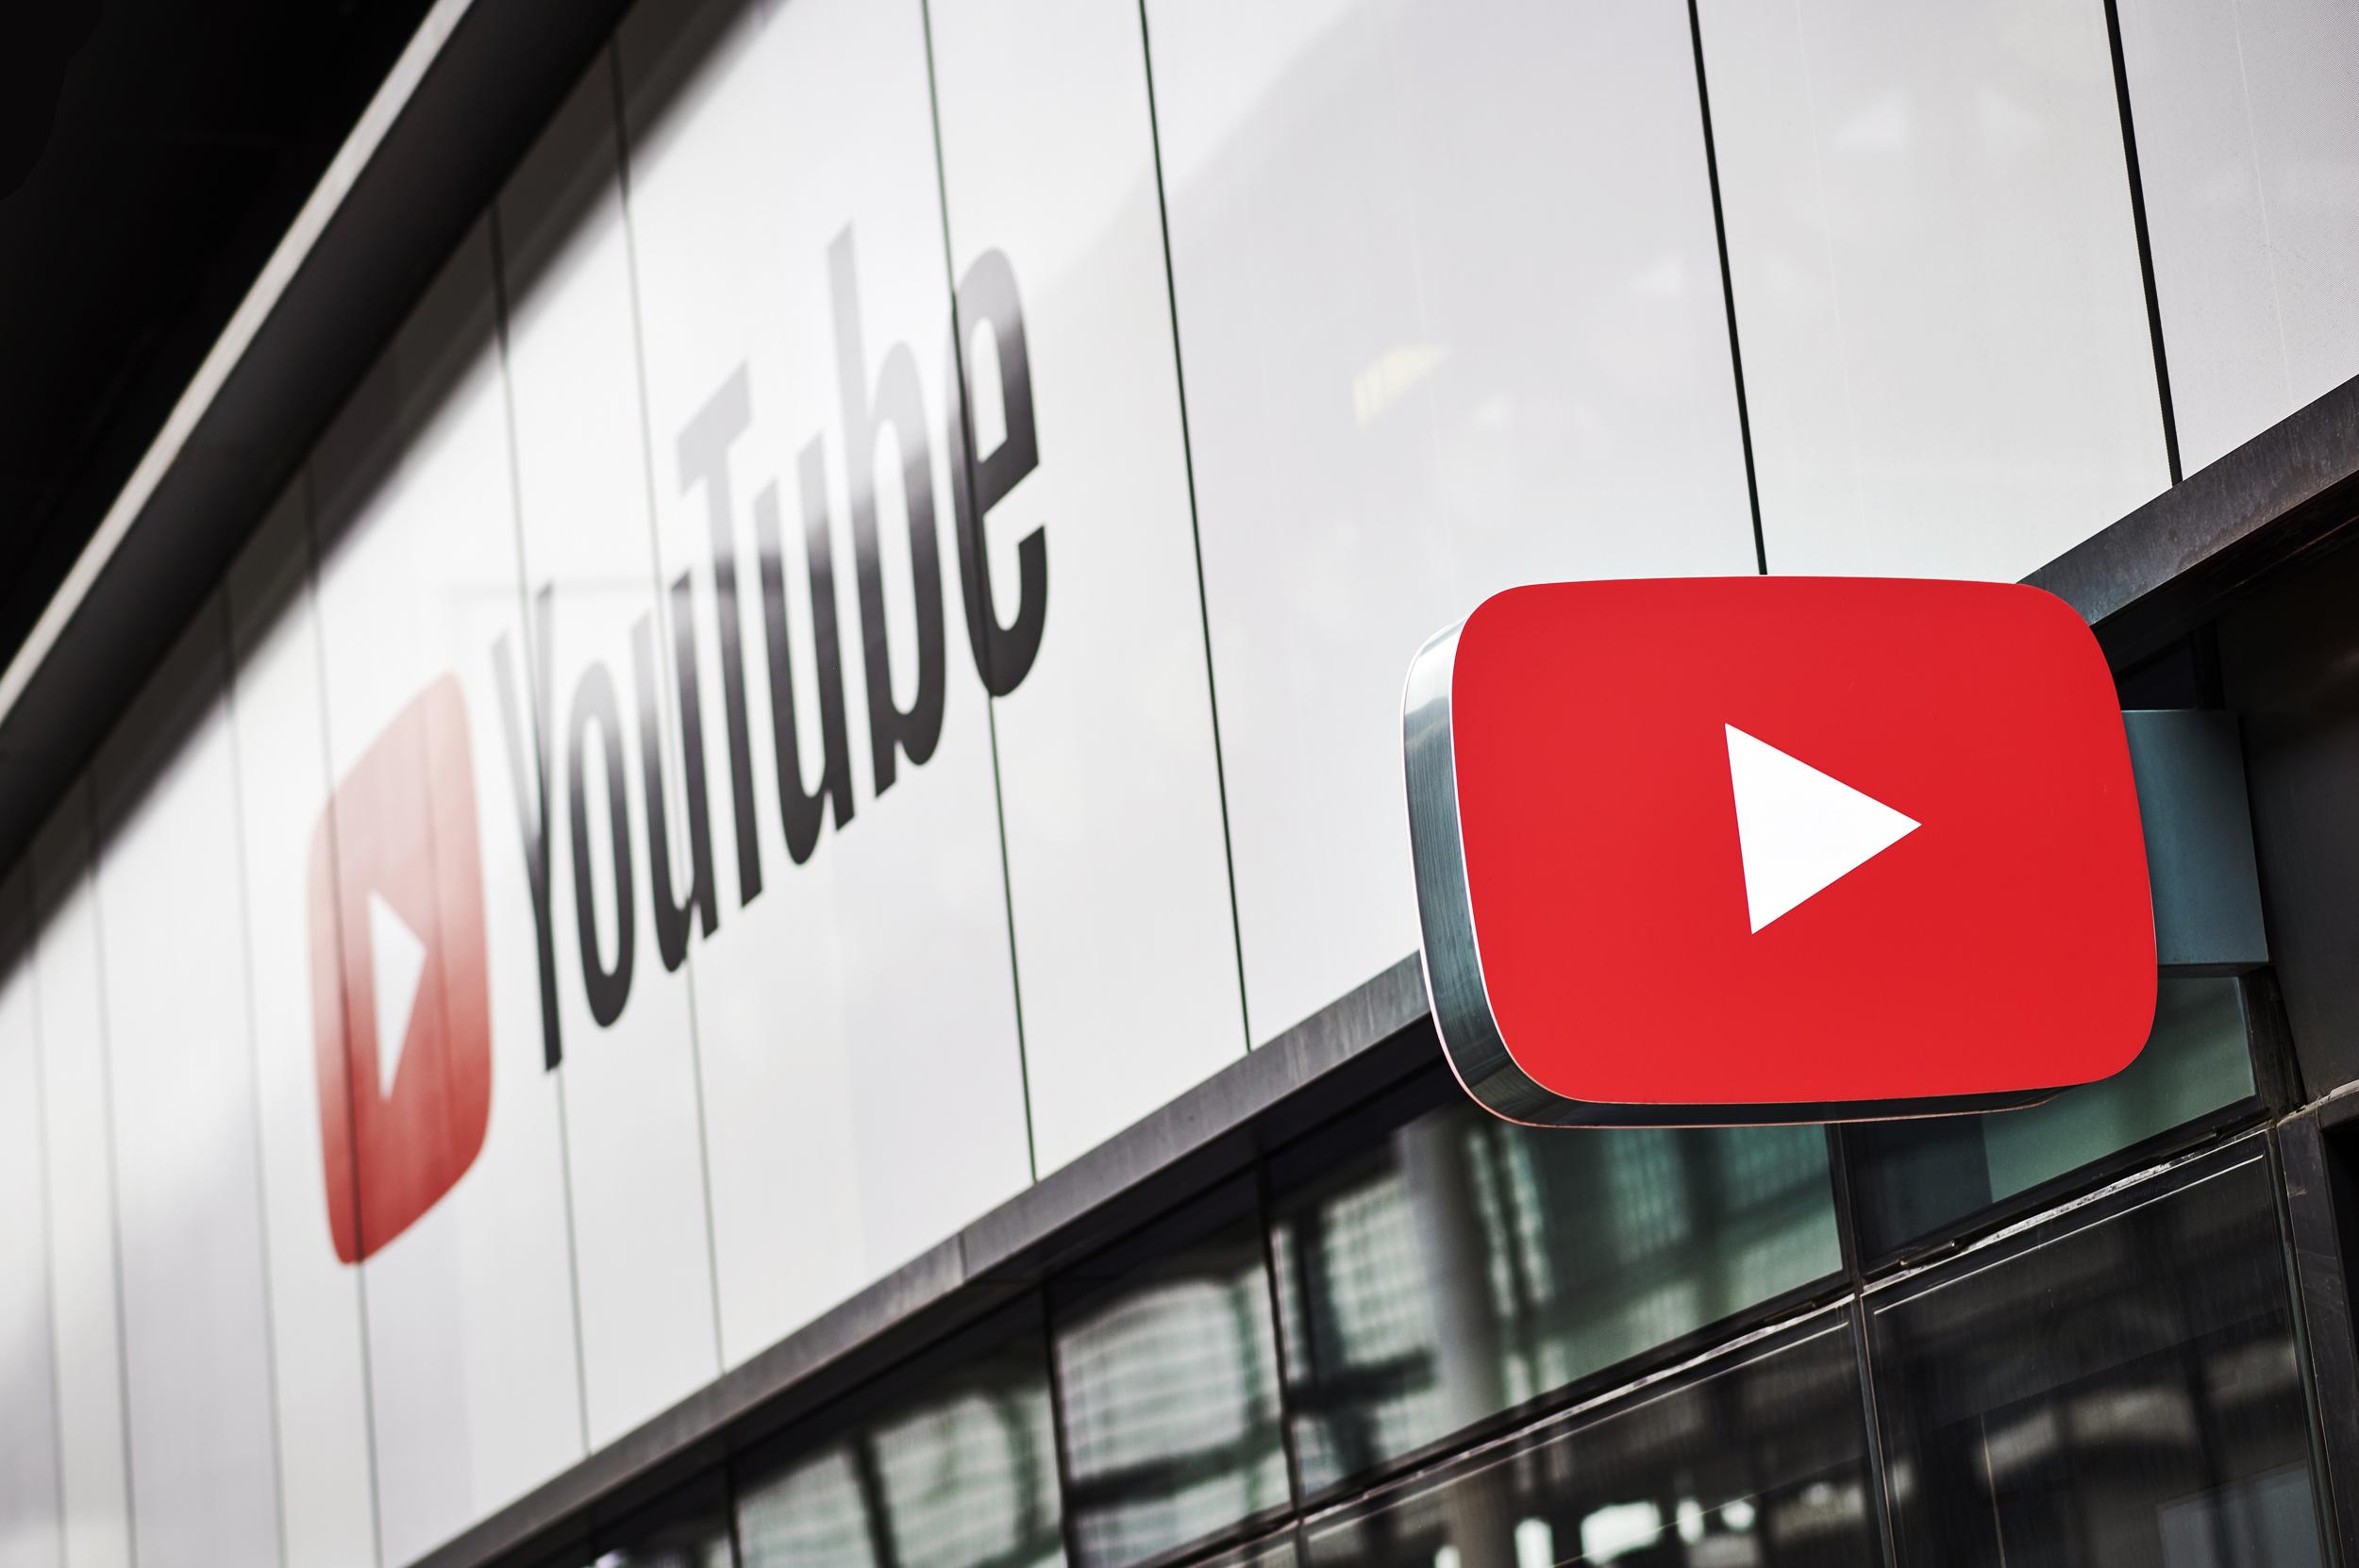 YouTube cracks down on anti-vaccine videos, bans major accounts